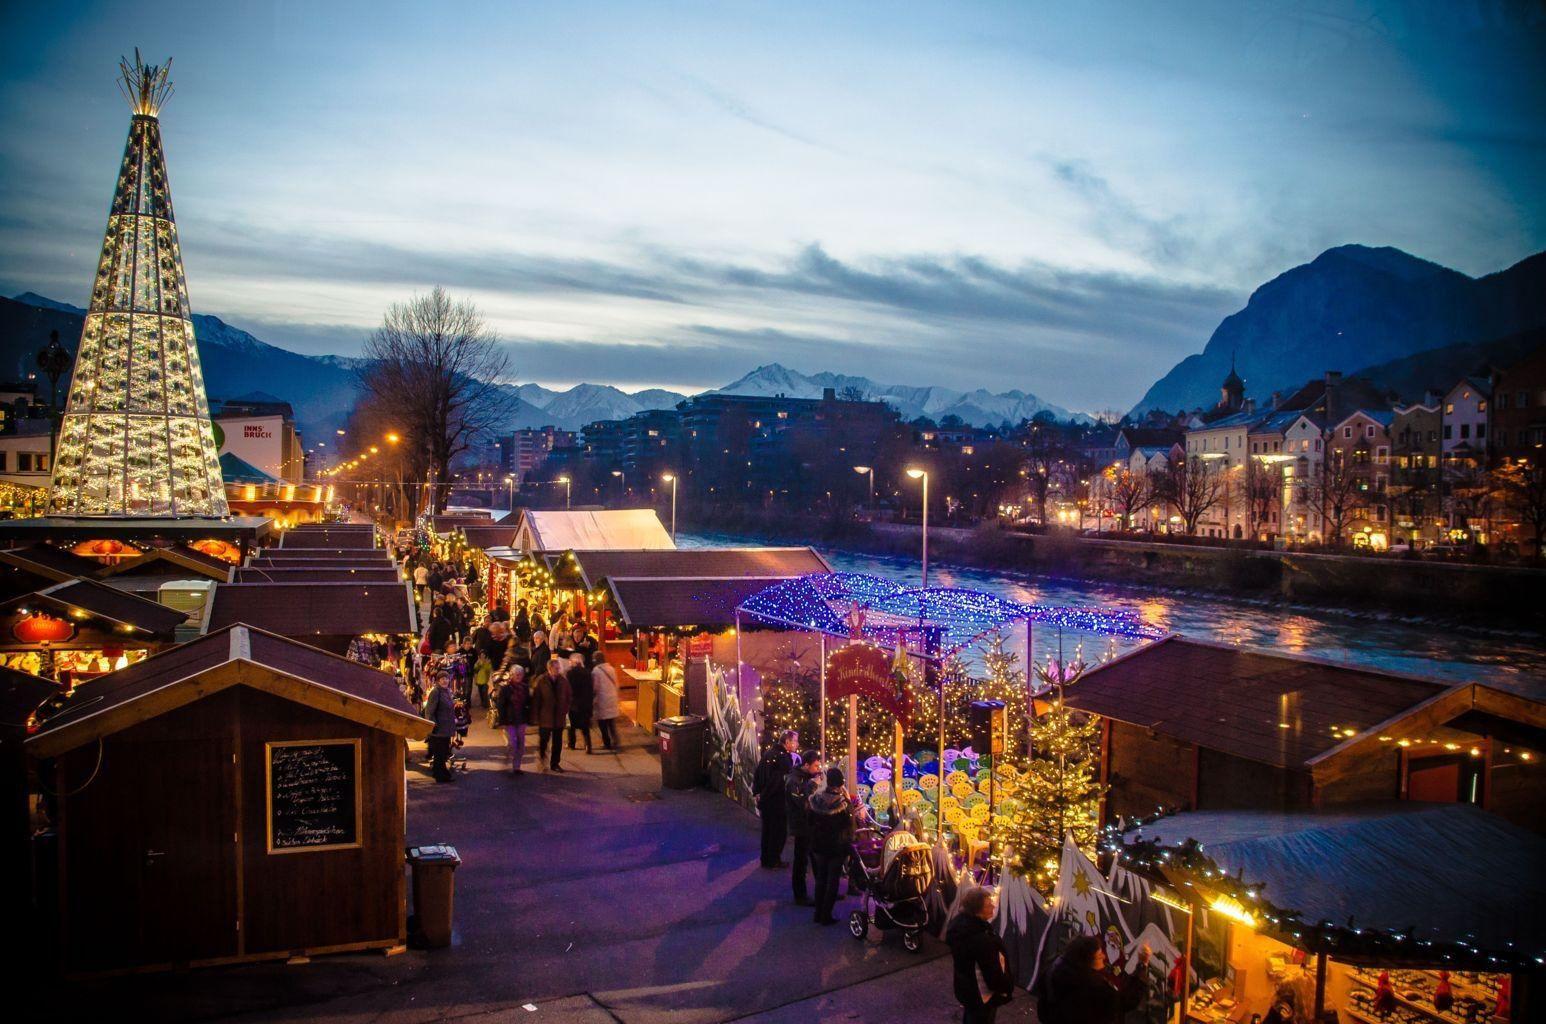 Die coolsten Locations in Innsbruck und Tirol - volunteeralert.com